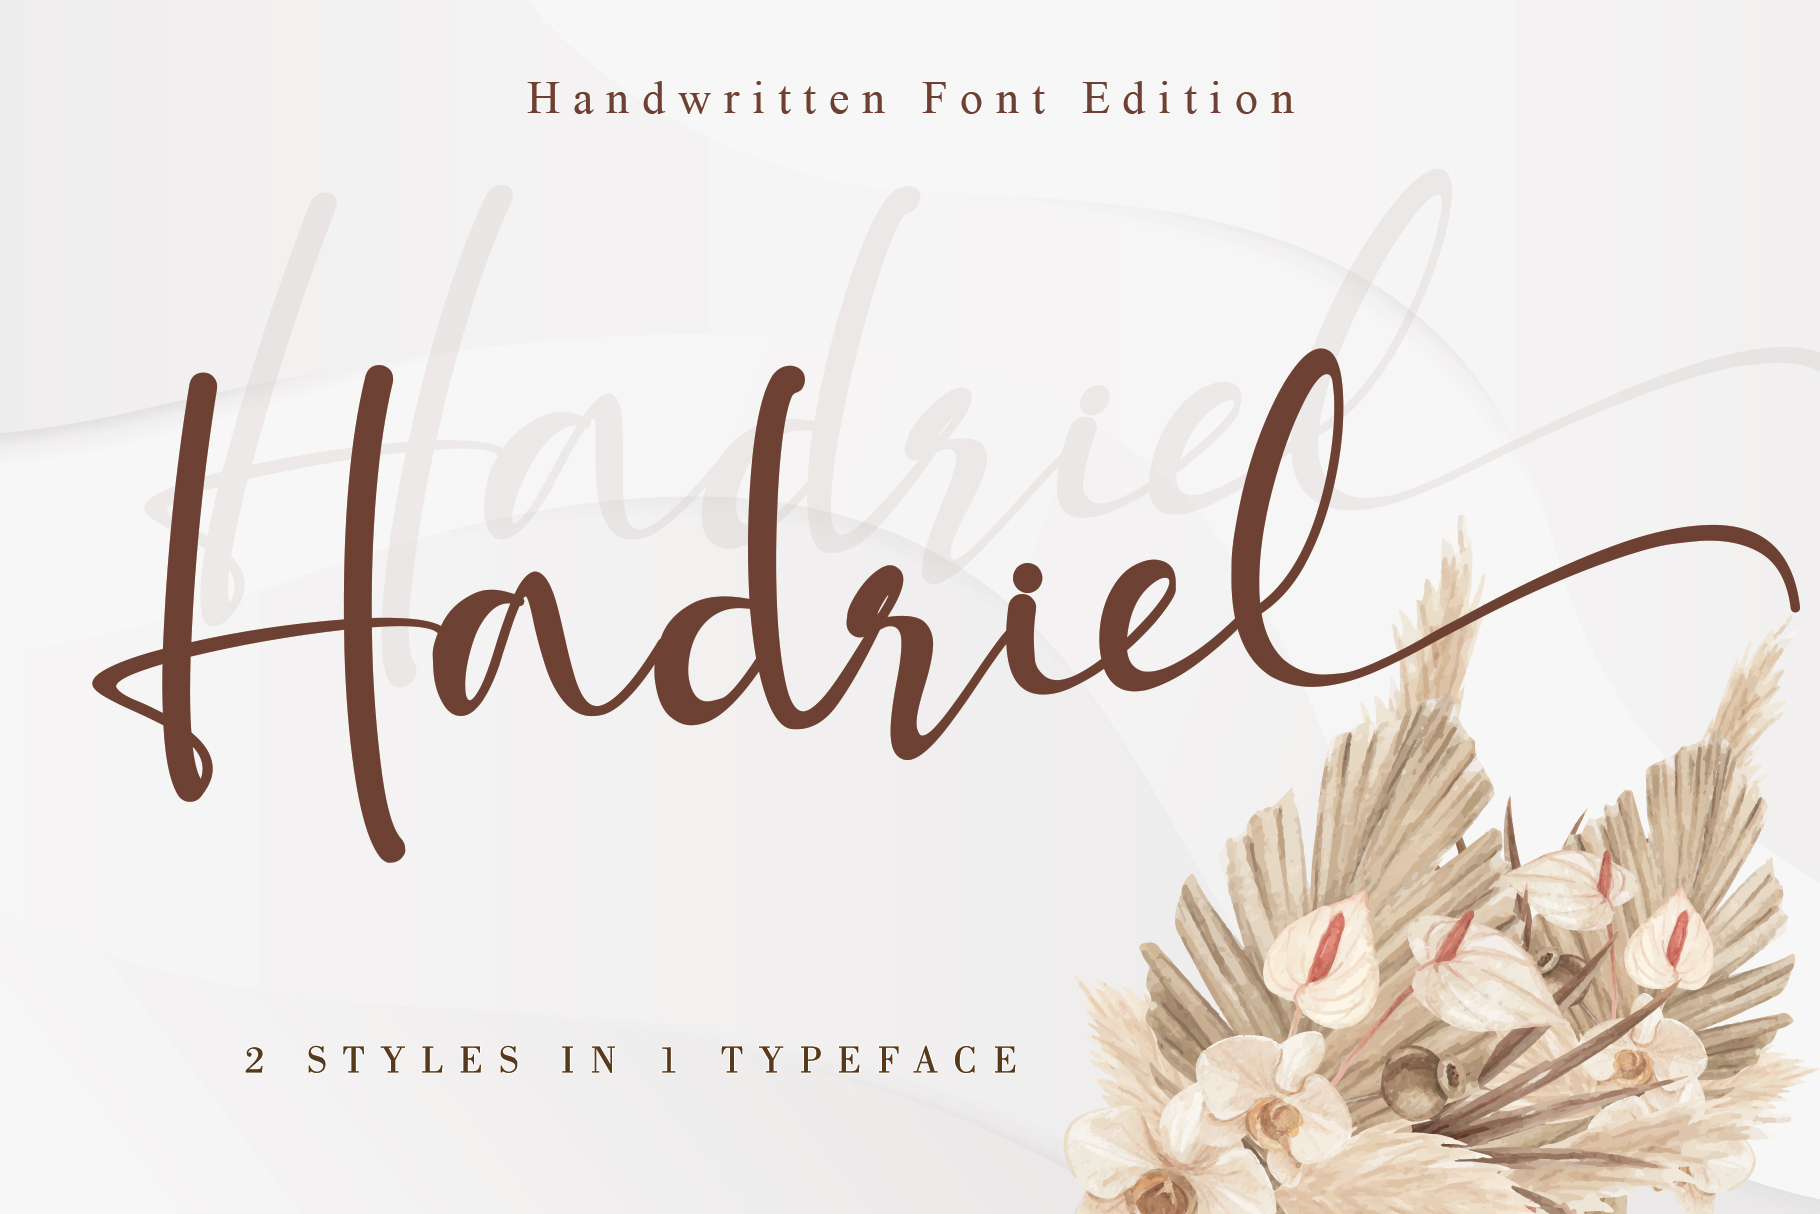 Hadriel-Fonts-4365351-1-1